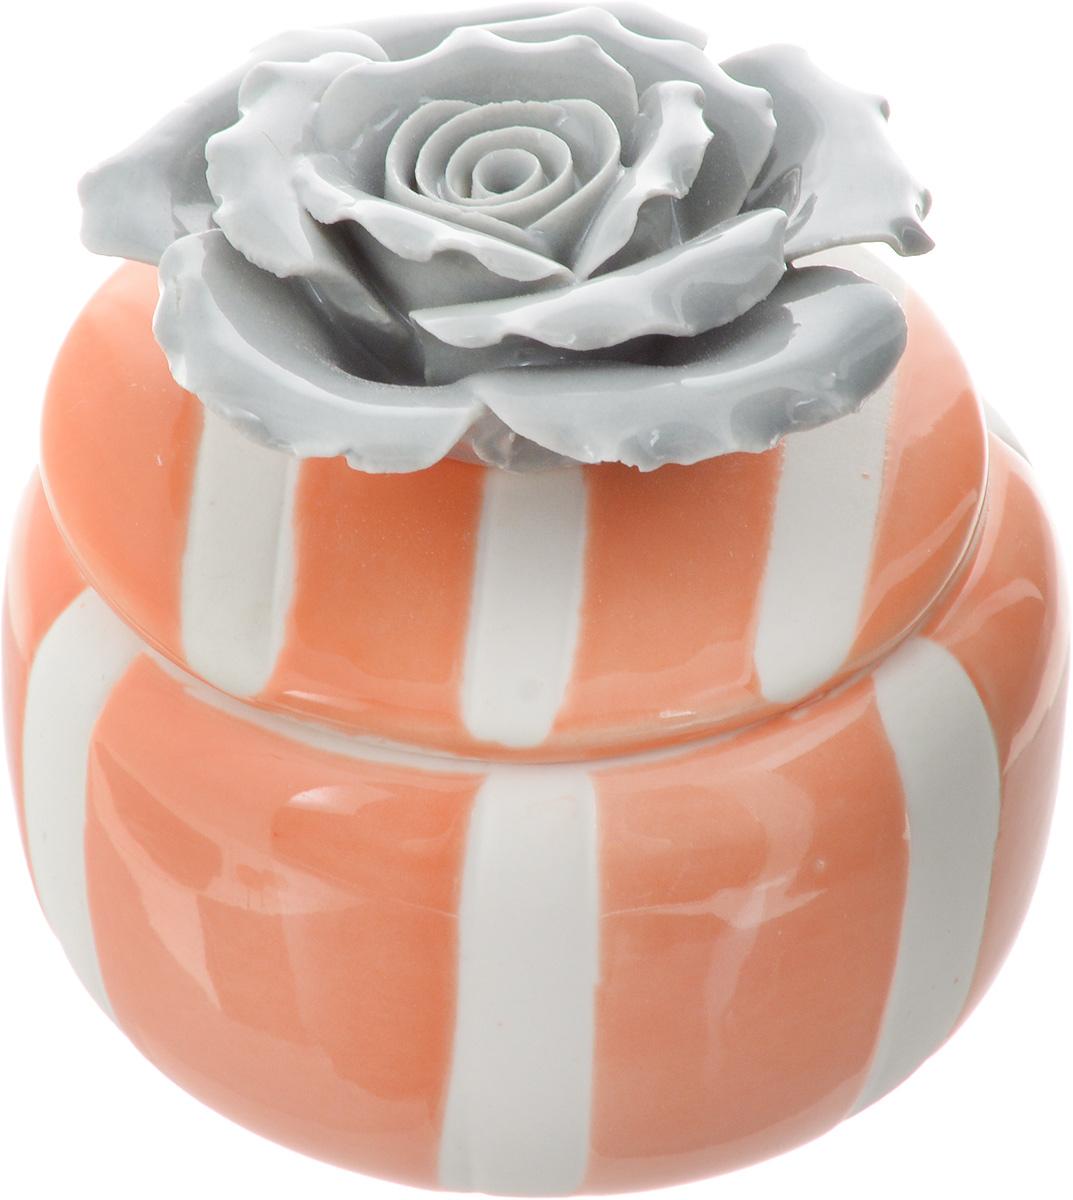 "Шкатулка для украшений ""Феникс-Презент"", цвет: оранжевый, серый, белый, 6,5 х 6,5 х 6,5 см"